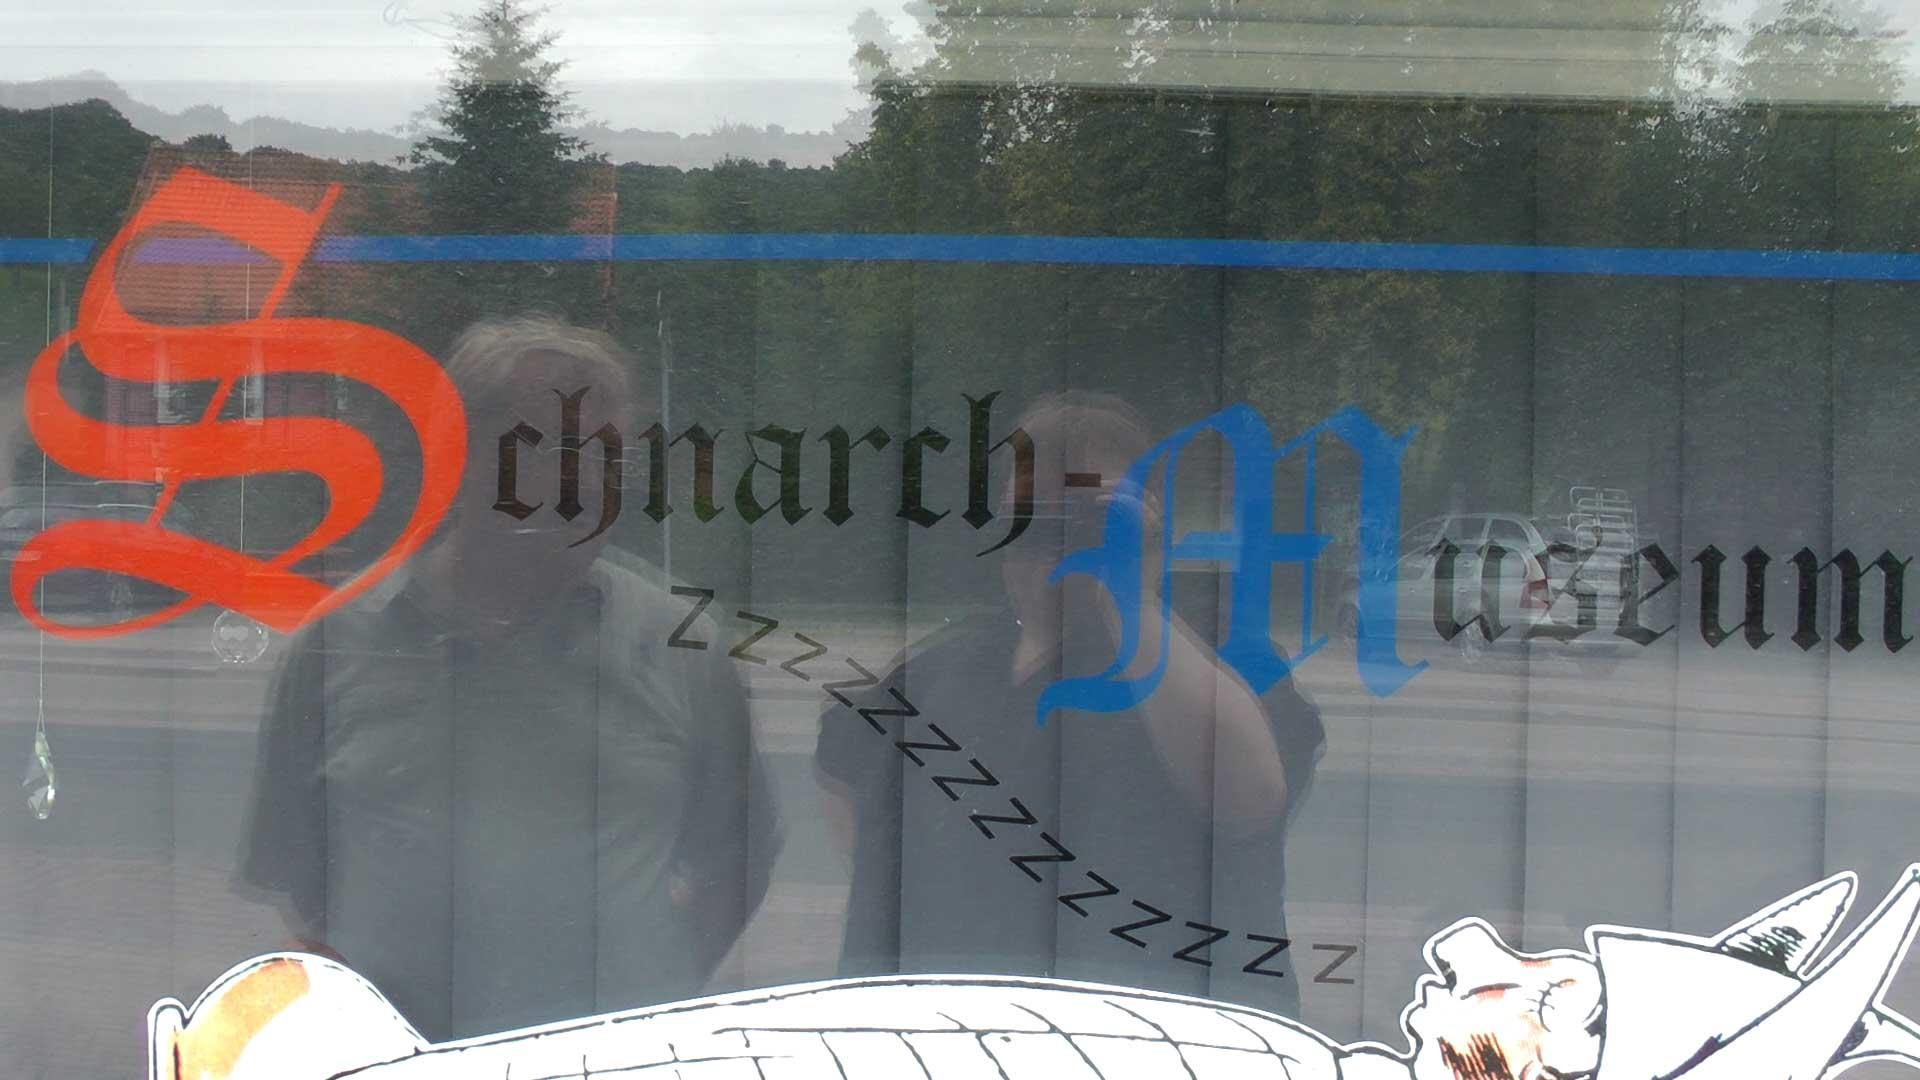 Schnarchmuseum